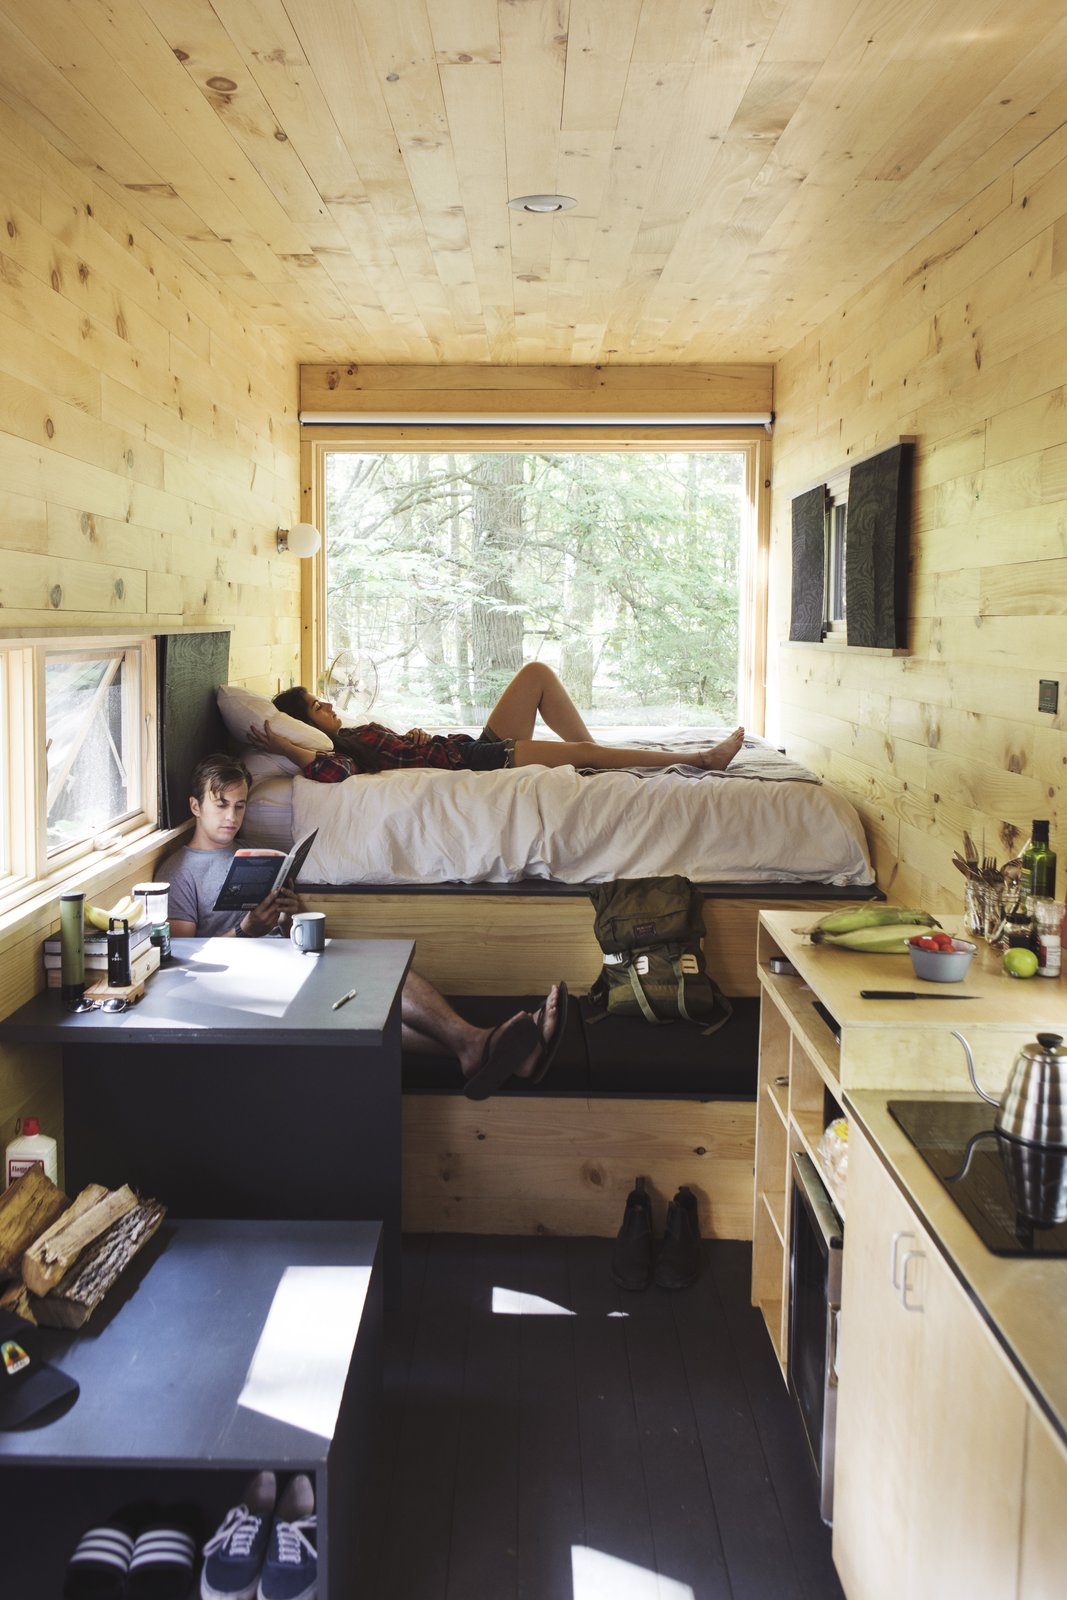 Cabin interior with plenty of built-in storage.